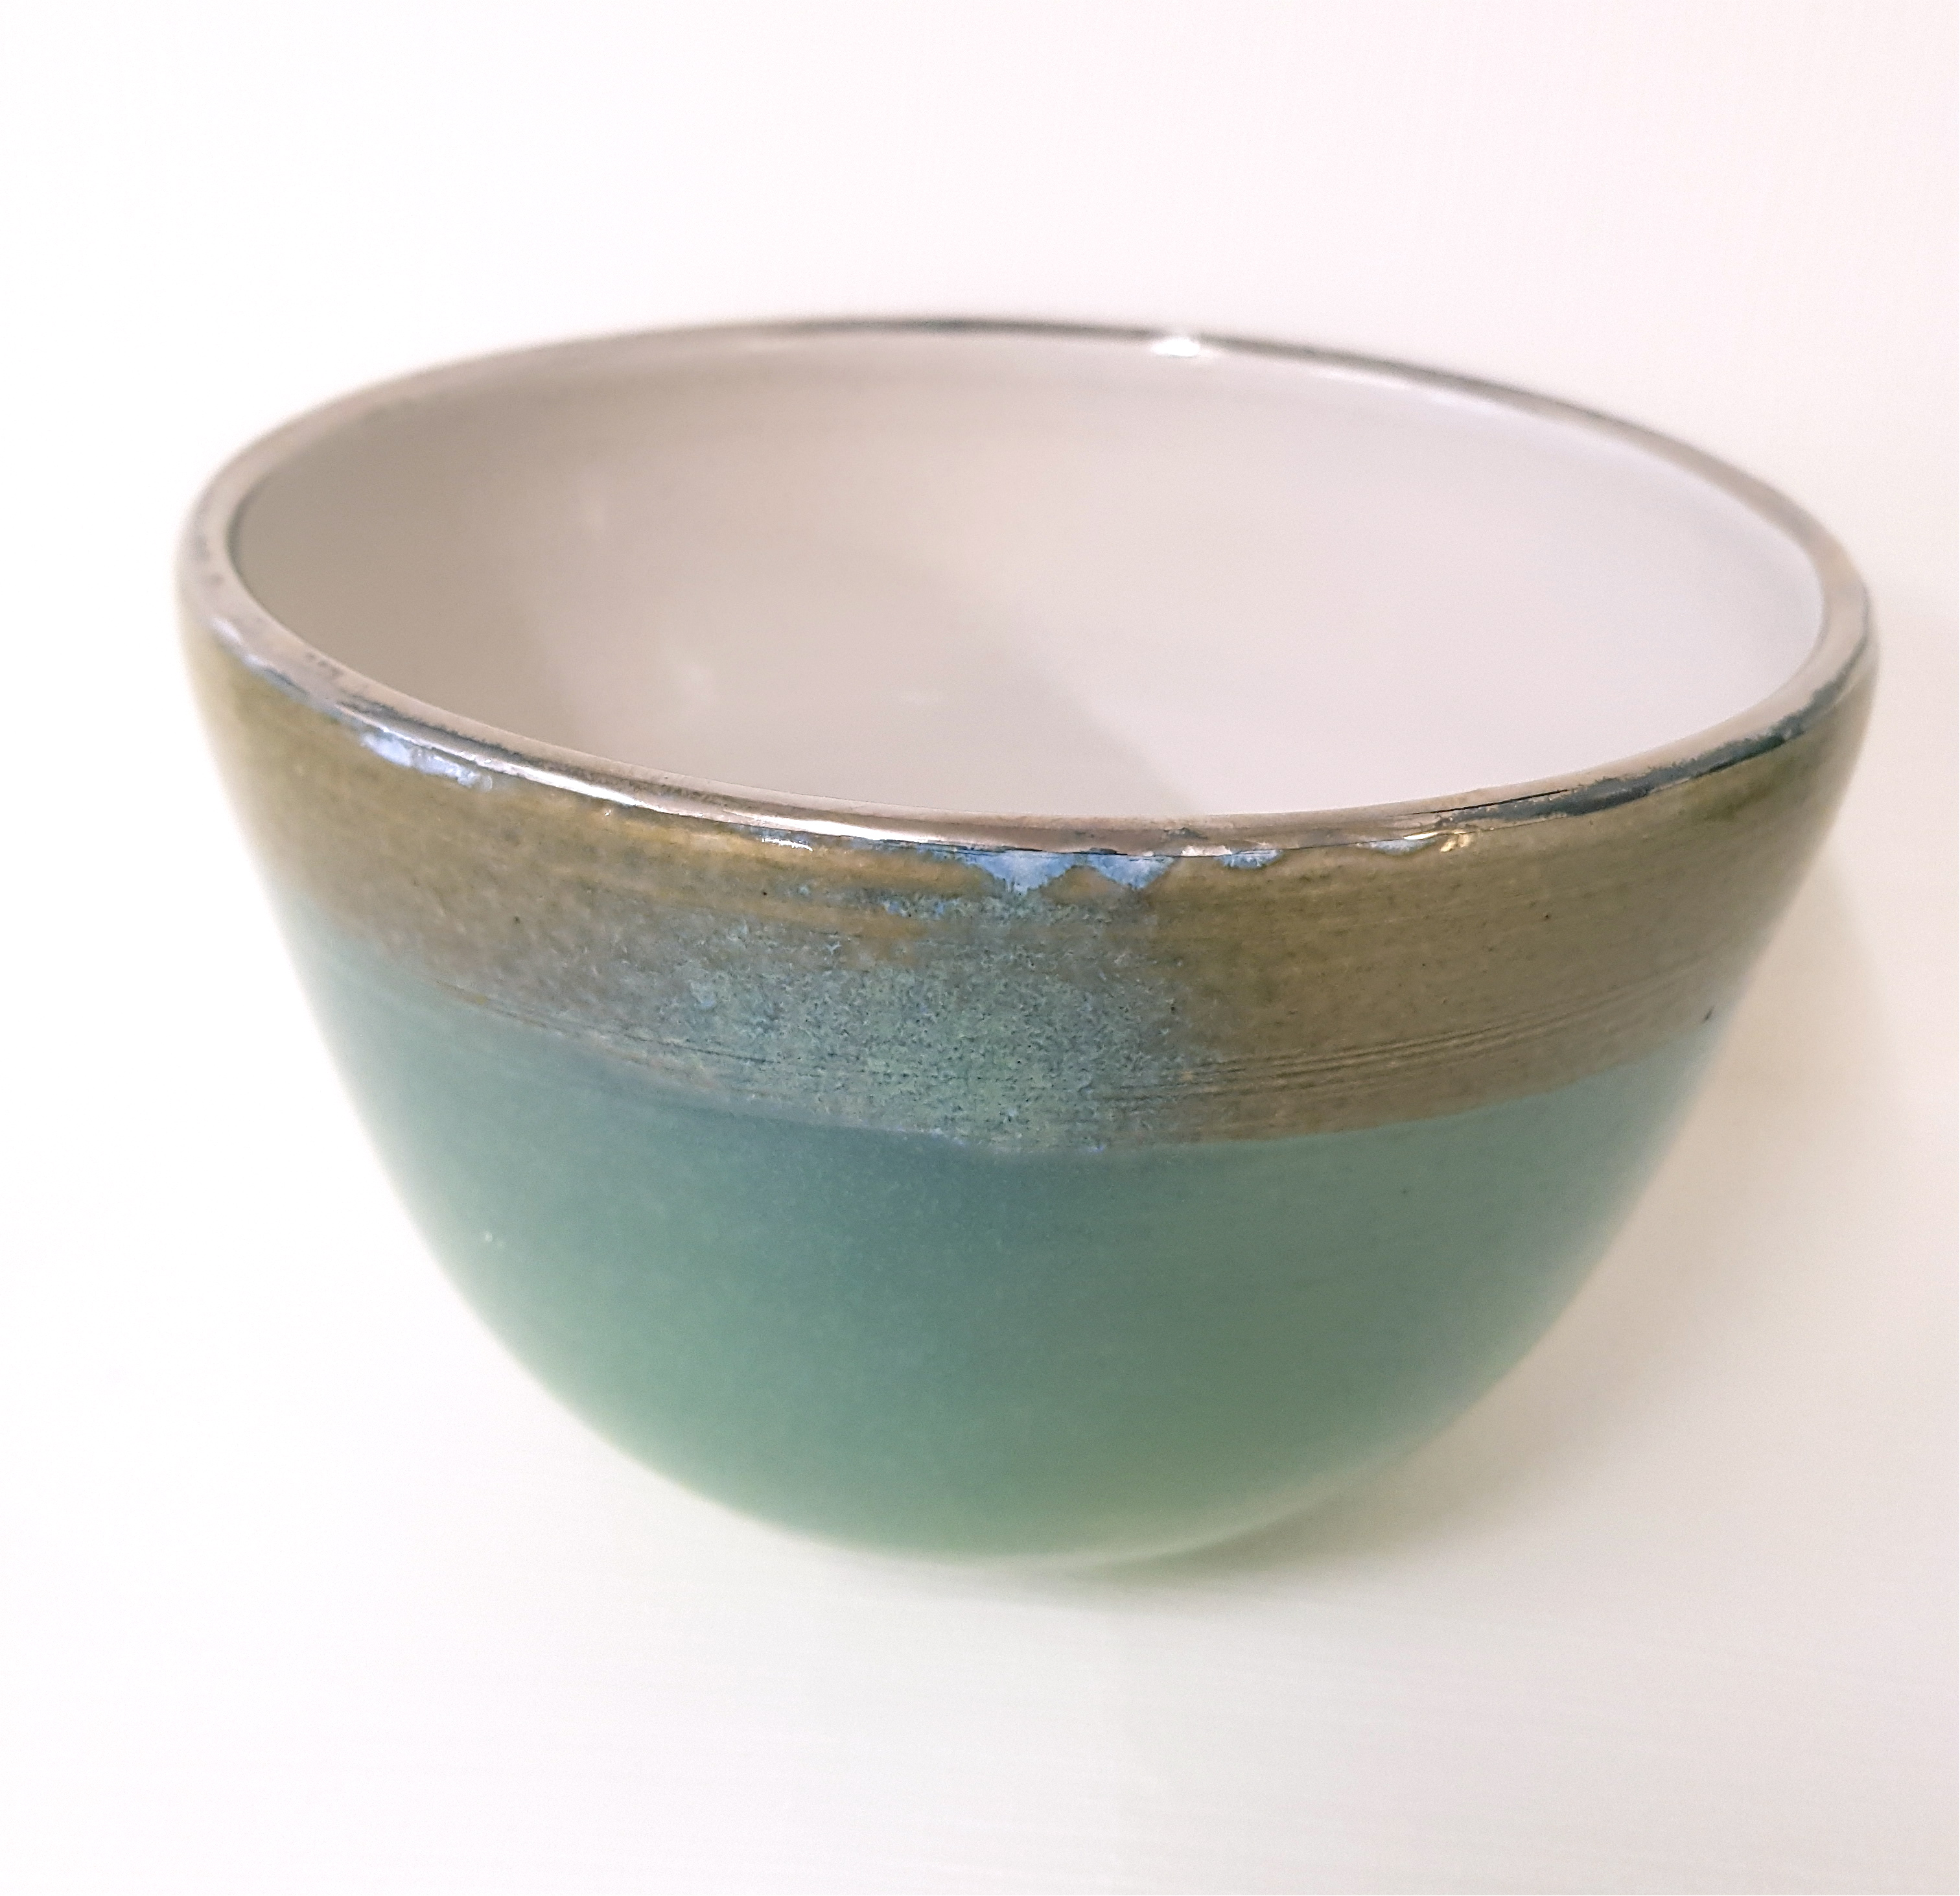 Töpferei la Ceramica, Töpfern, Keramik, Unikat, Töpferkurse, Teamevent